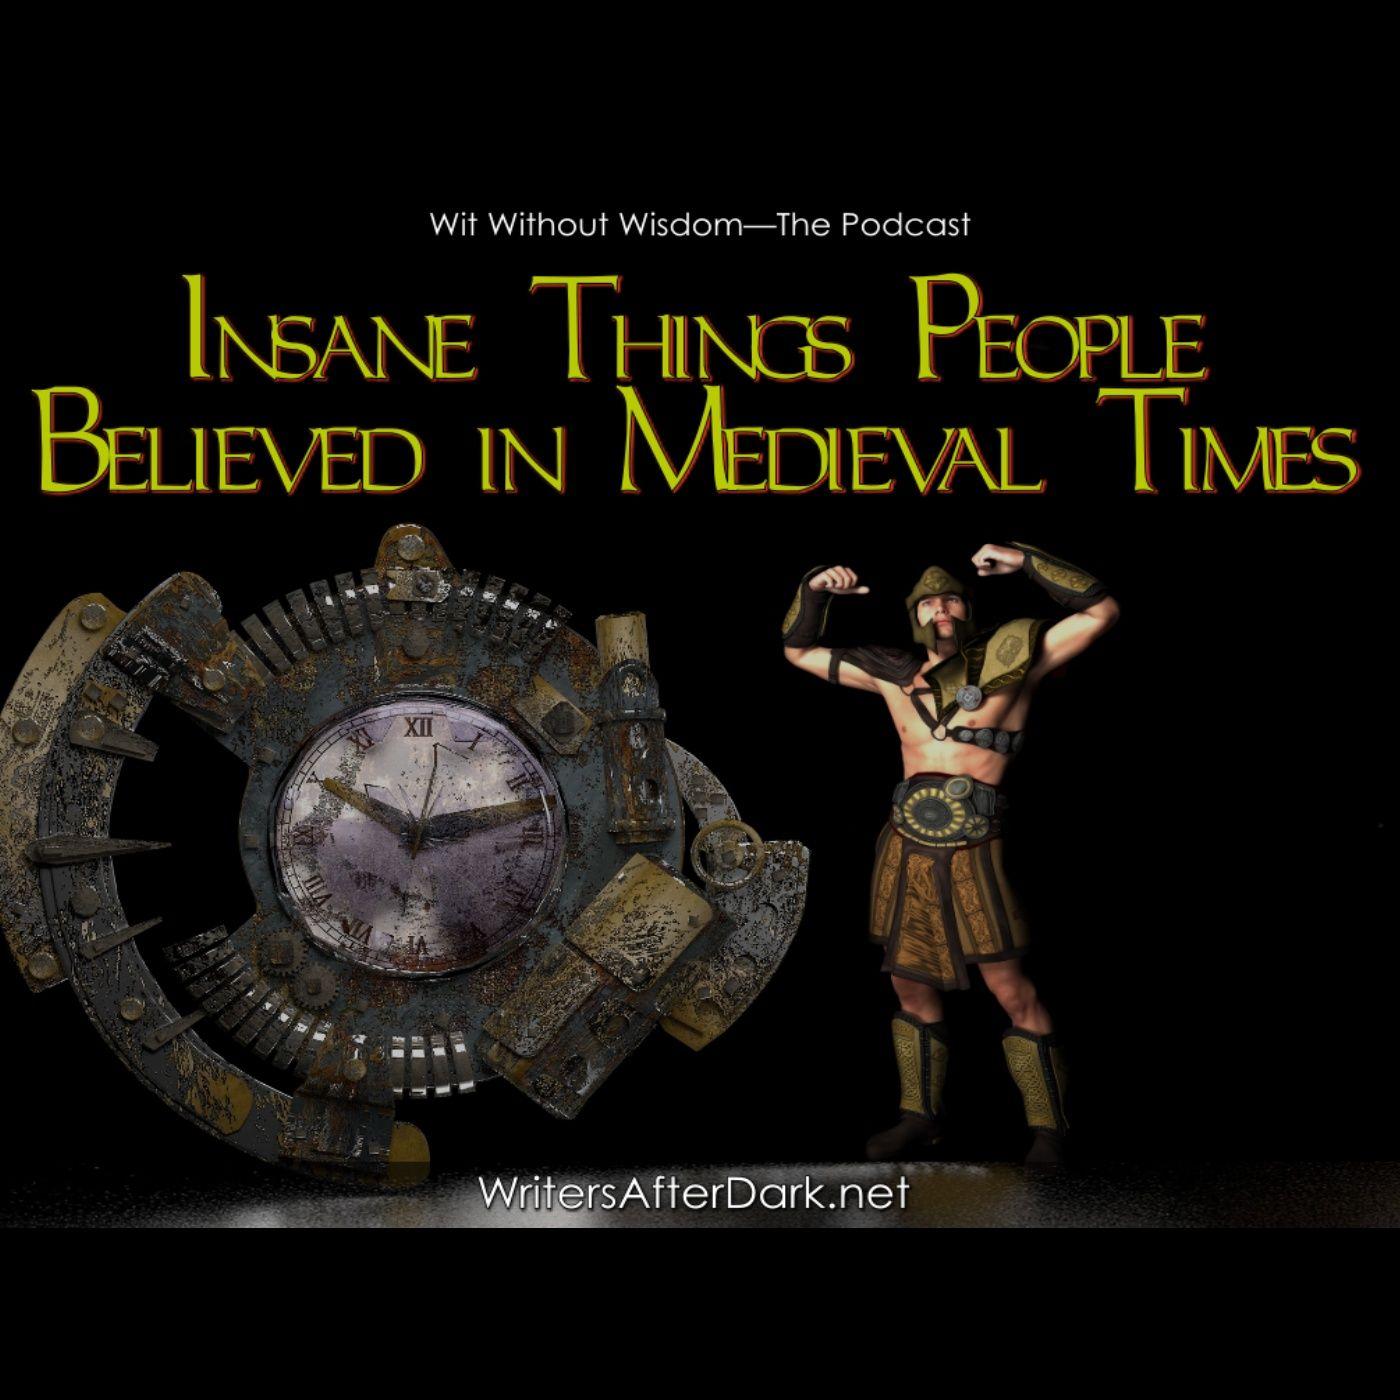 Insane Things People Believed in Medieval Times